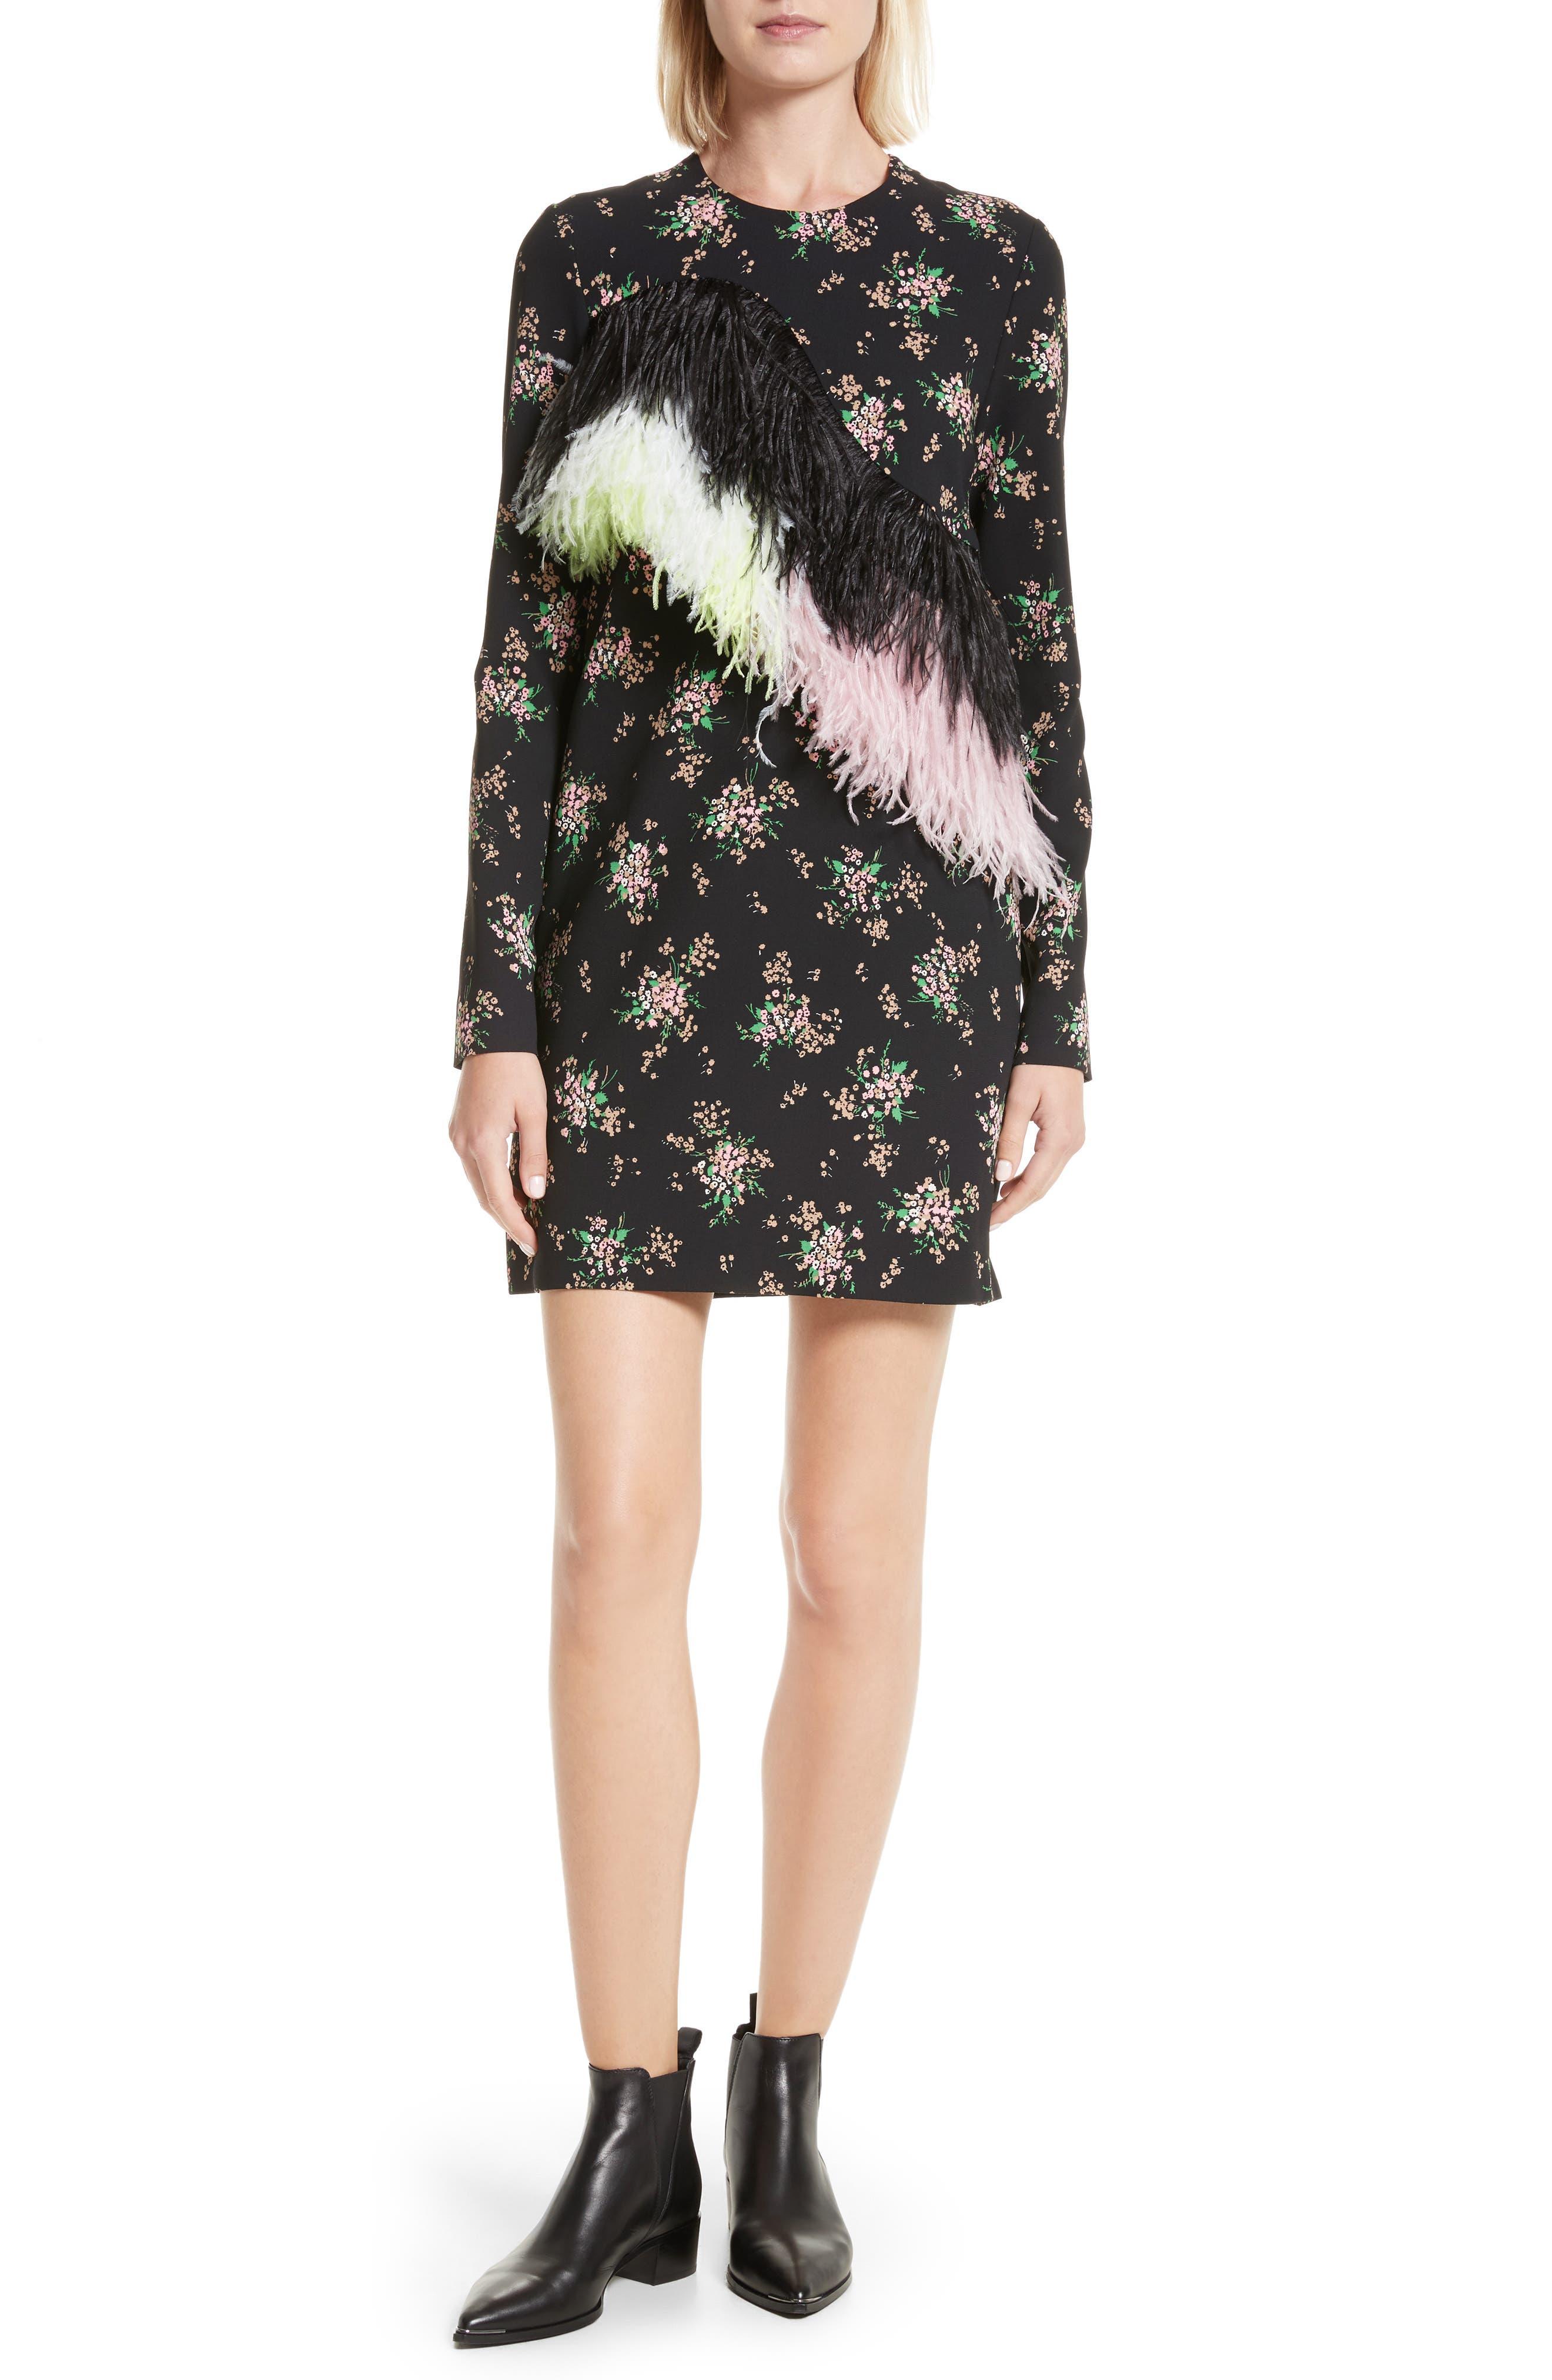 MSGM Ostrich Feather Trim Floral Print Dress